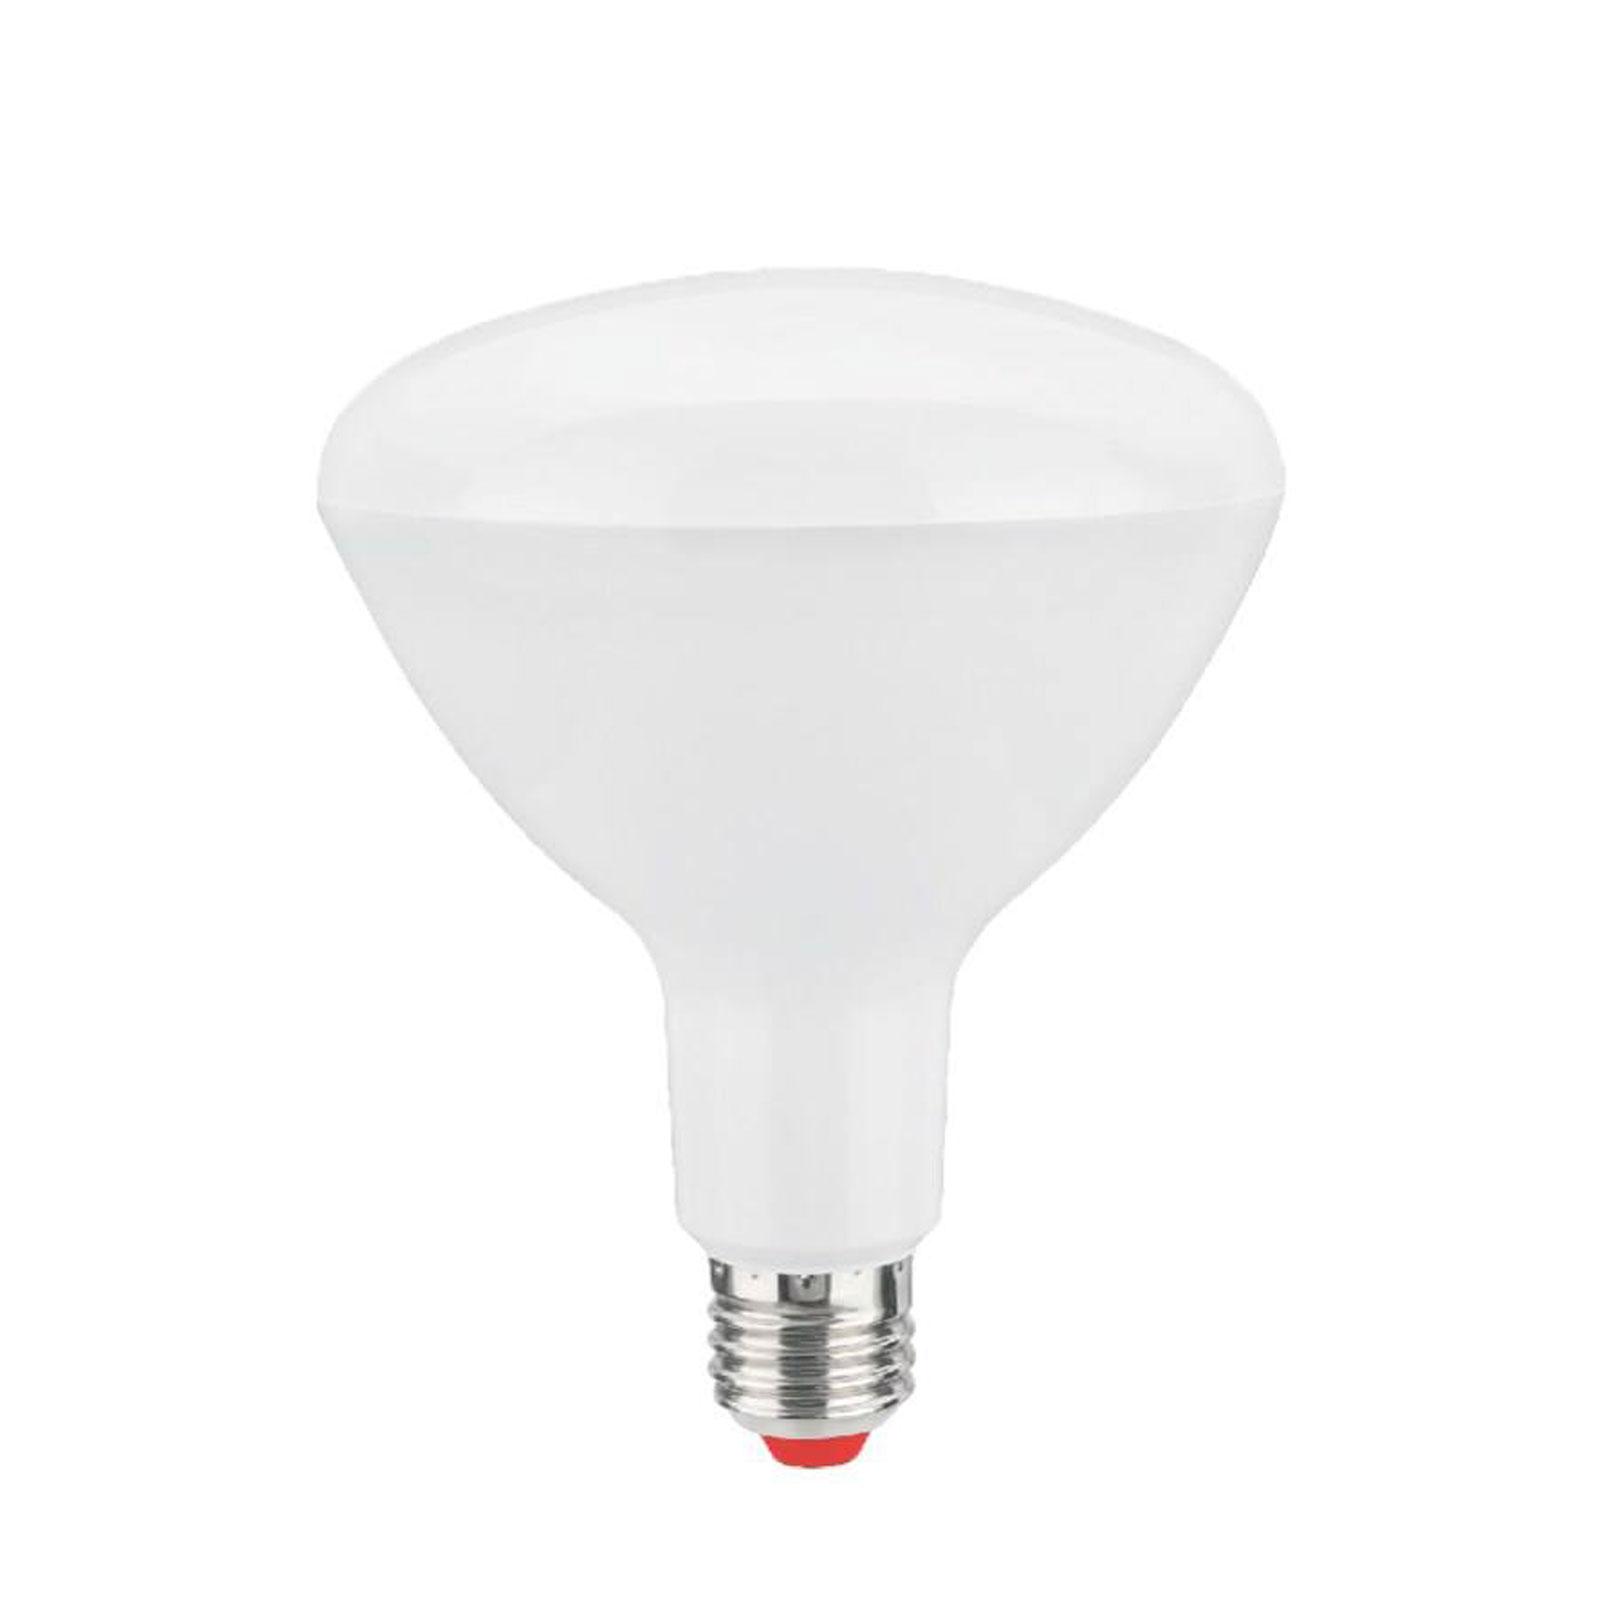 لامپ ال ای دی رفلکتور 12 وات TCL